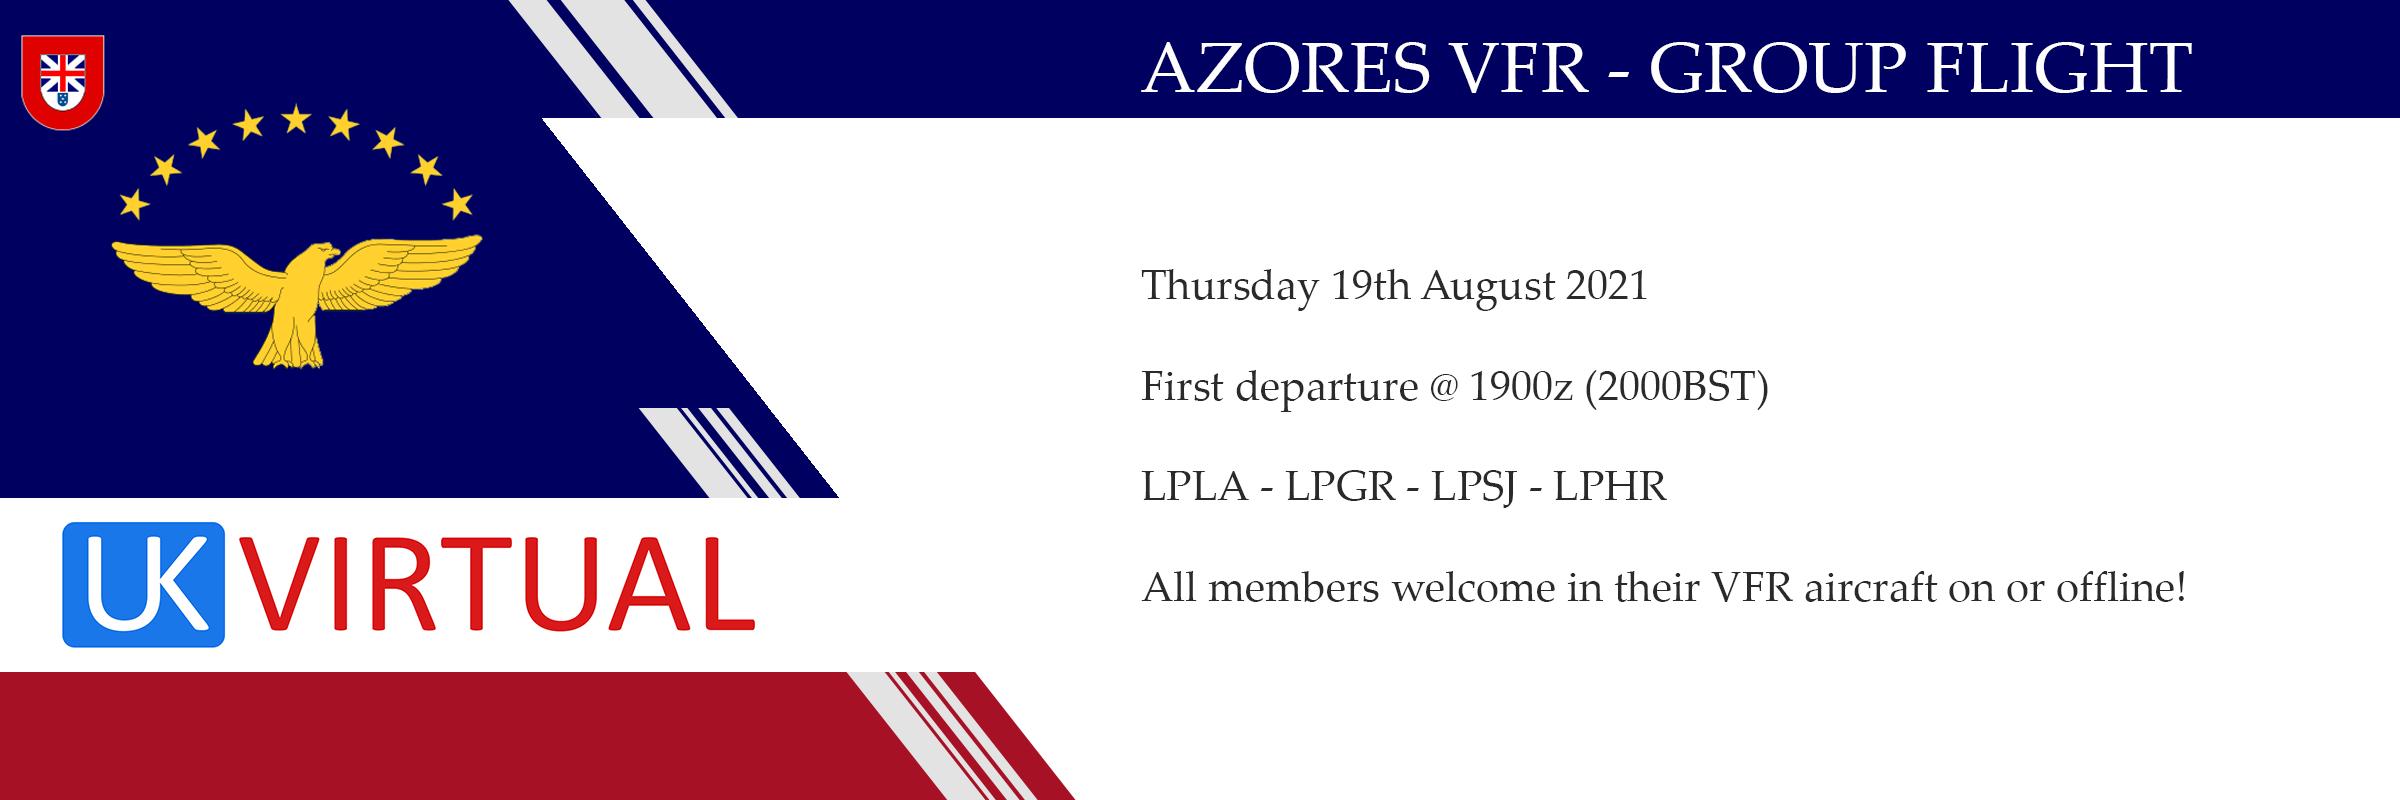 AZORES VFR Group Flight